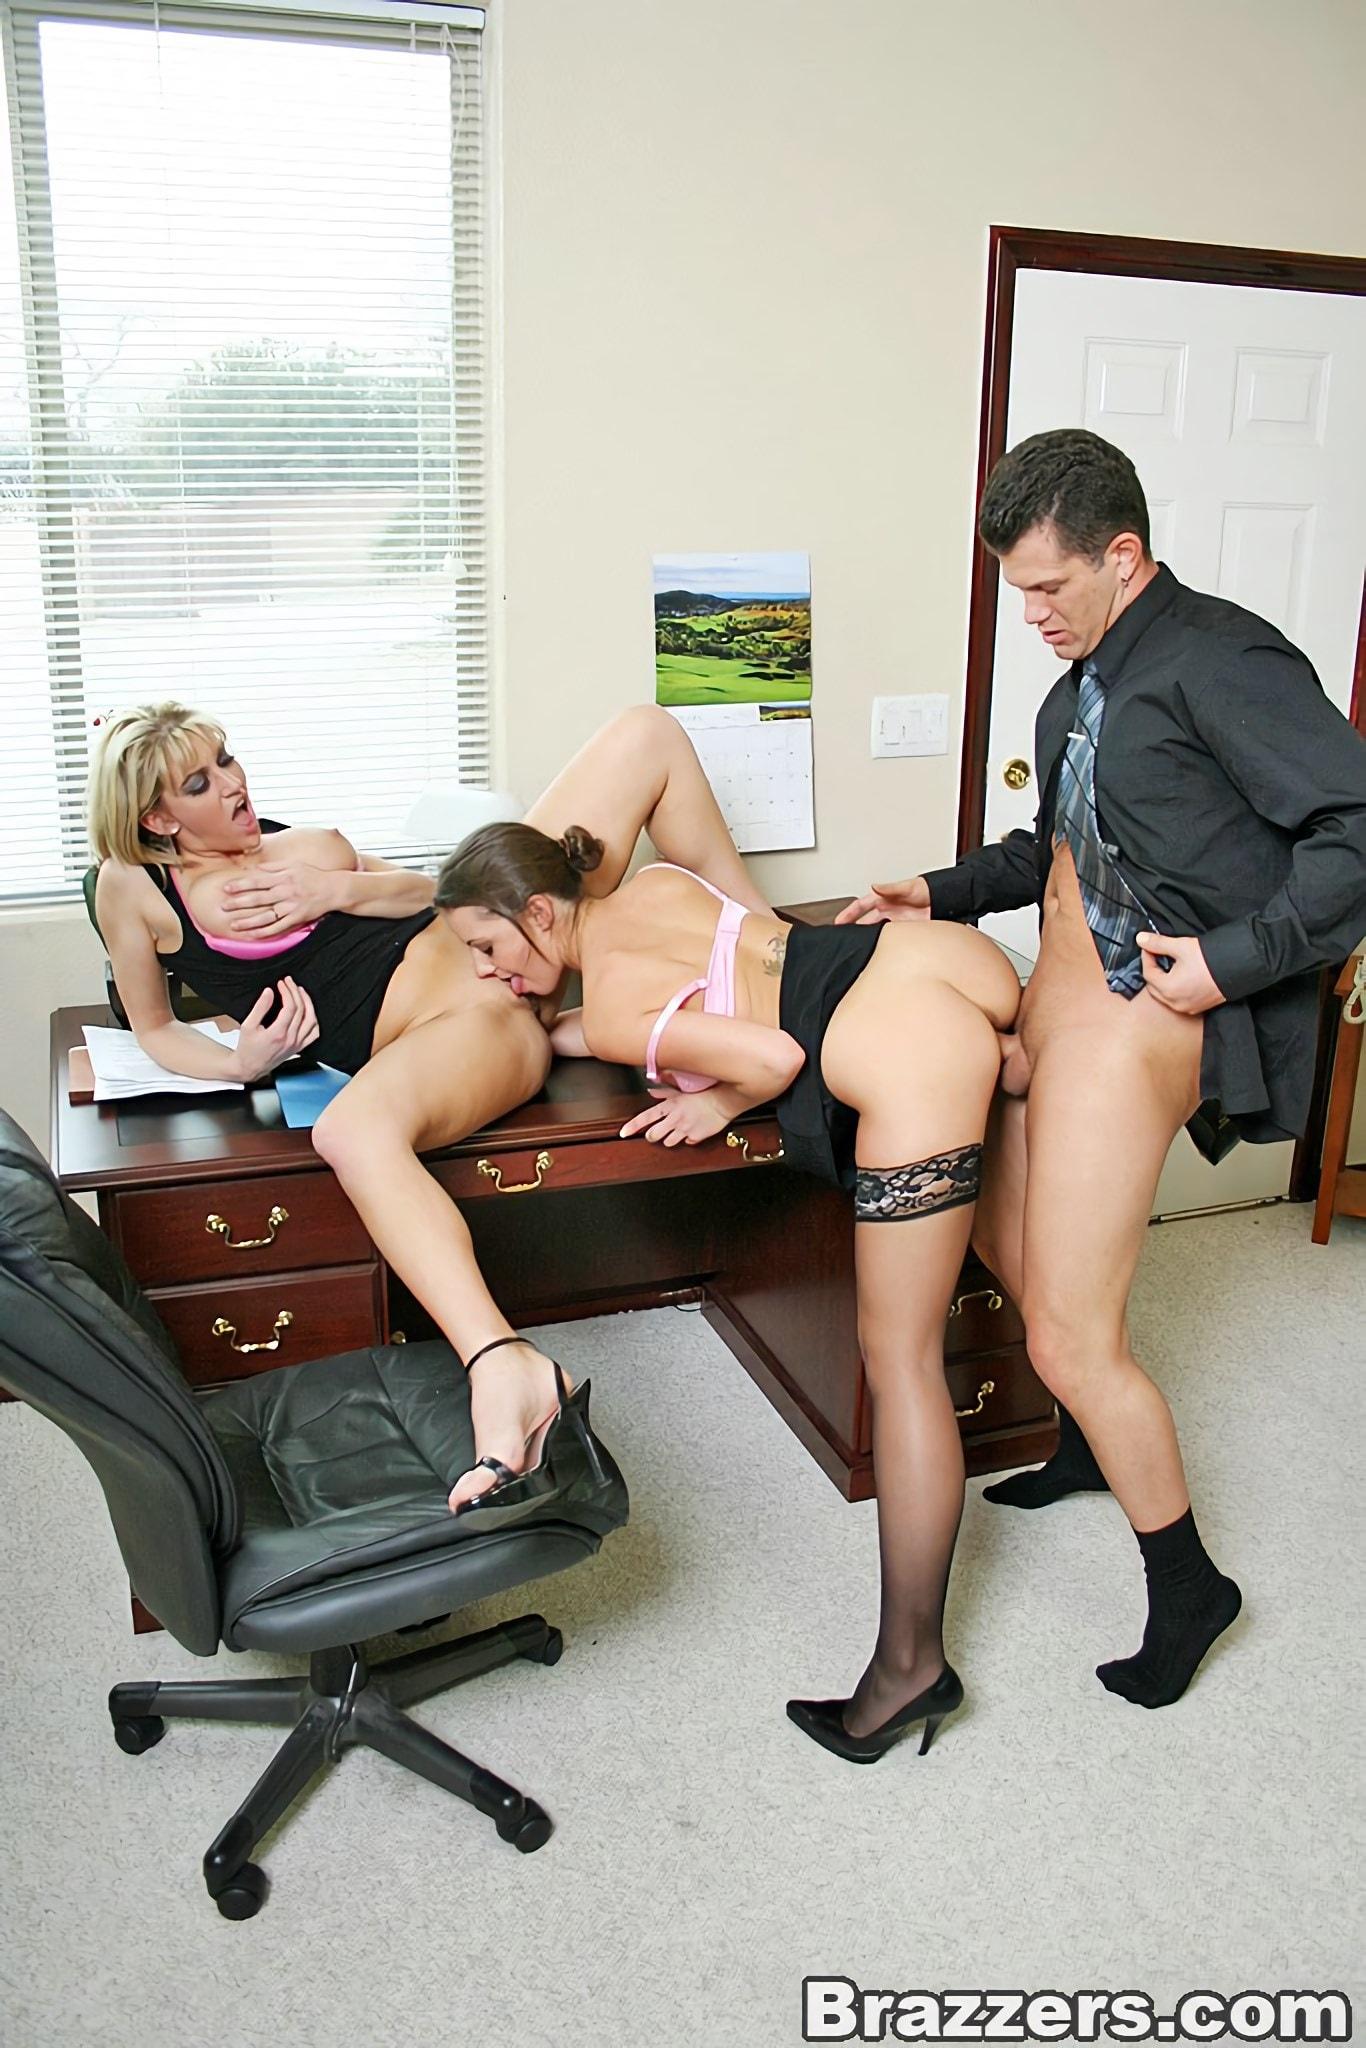 dama-porno-v-ofise-v-troem-foto-kurorte